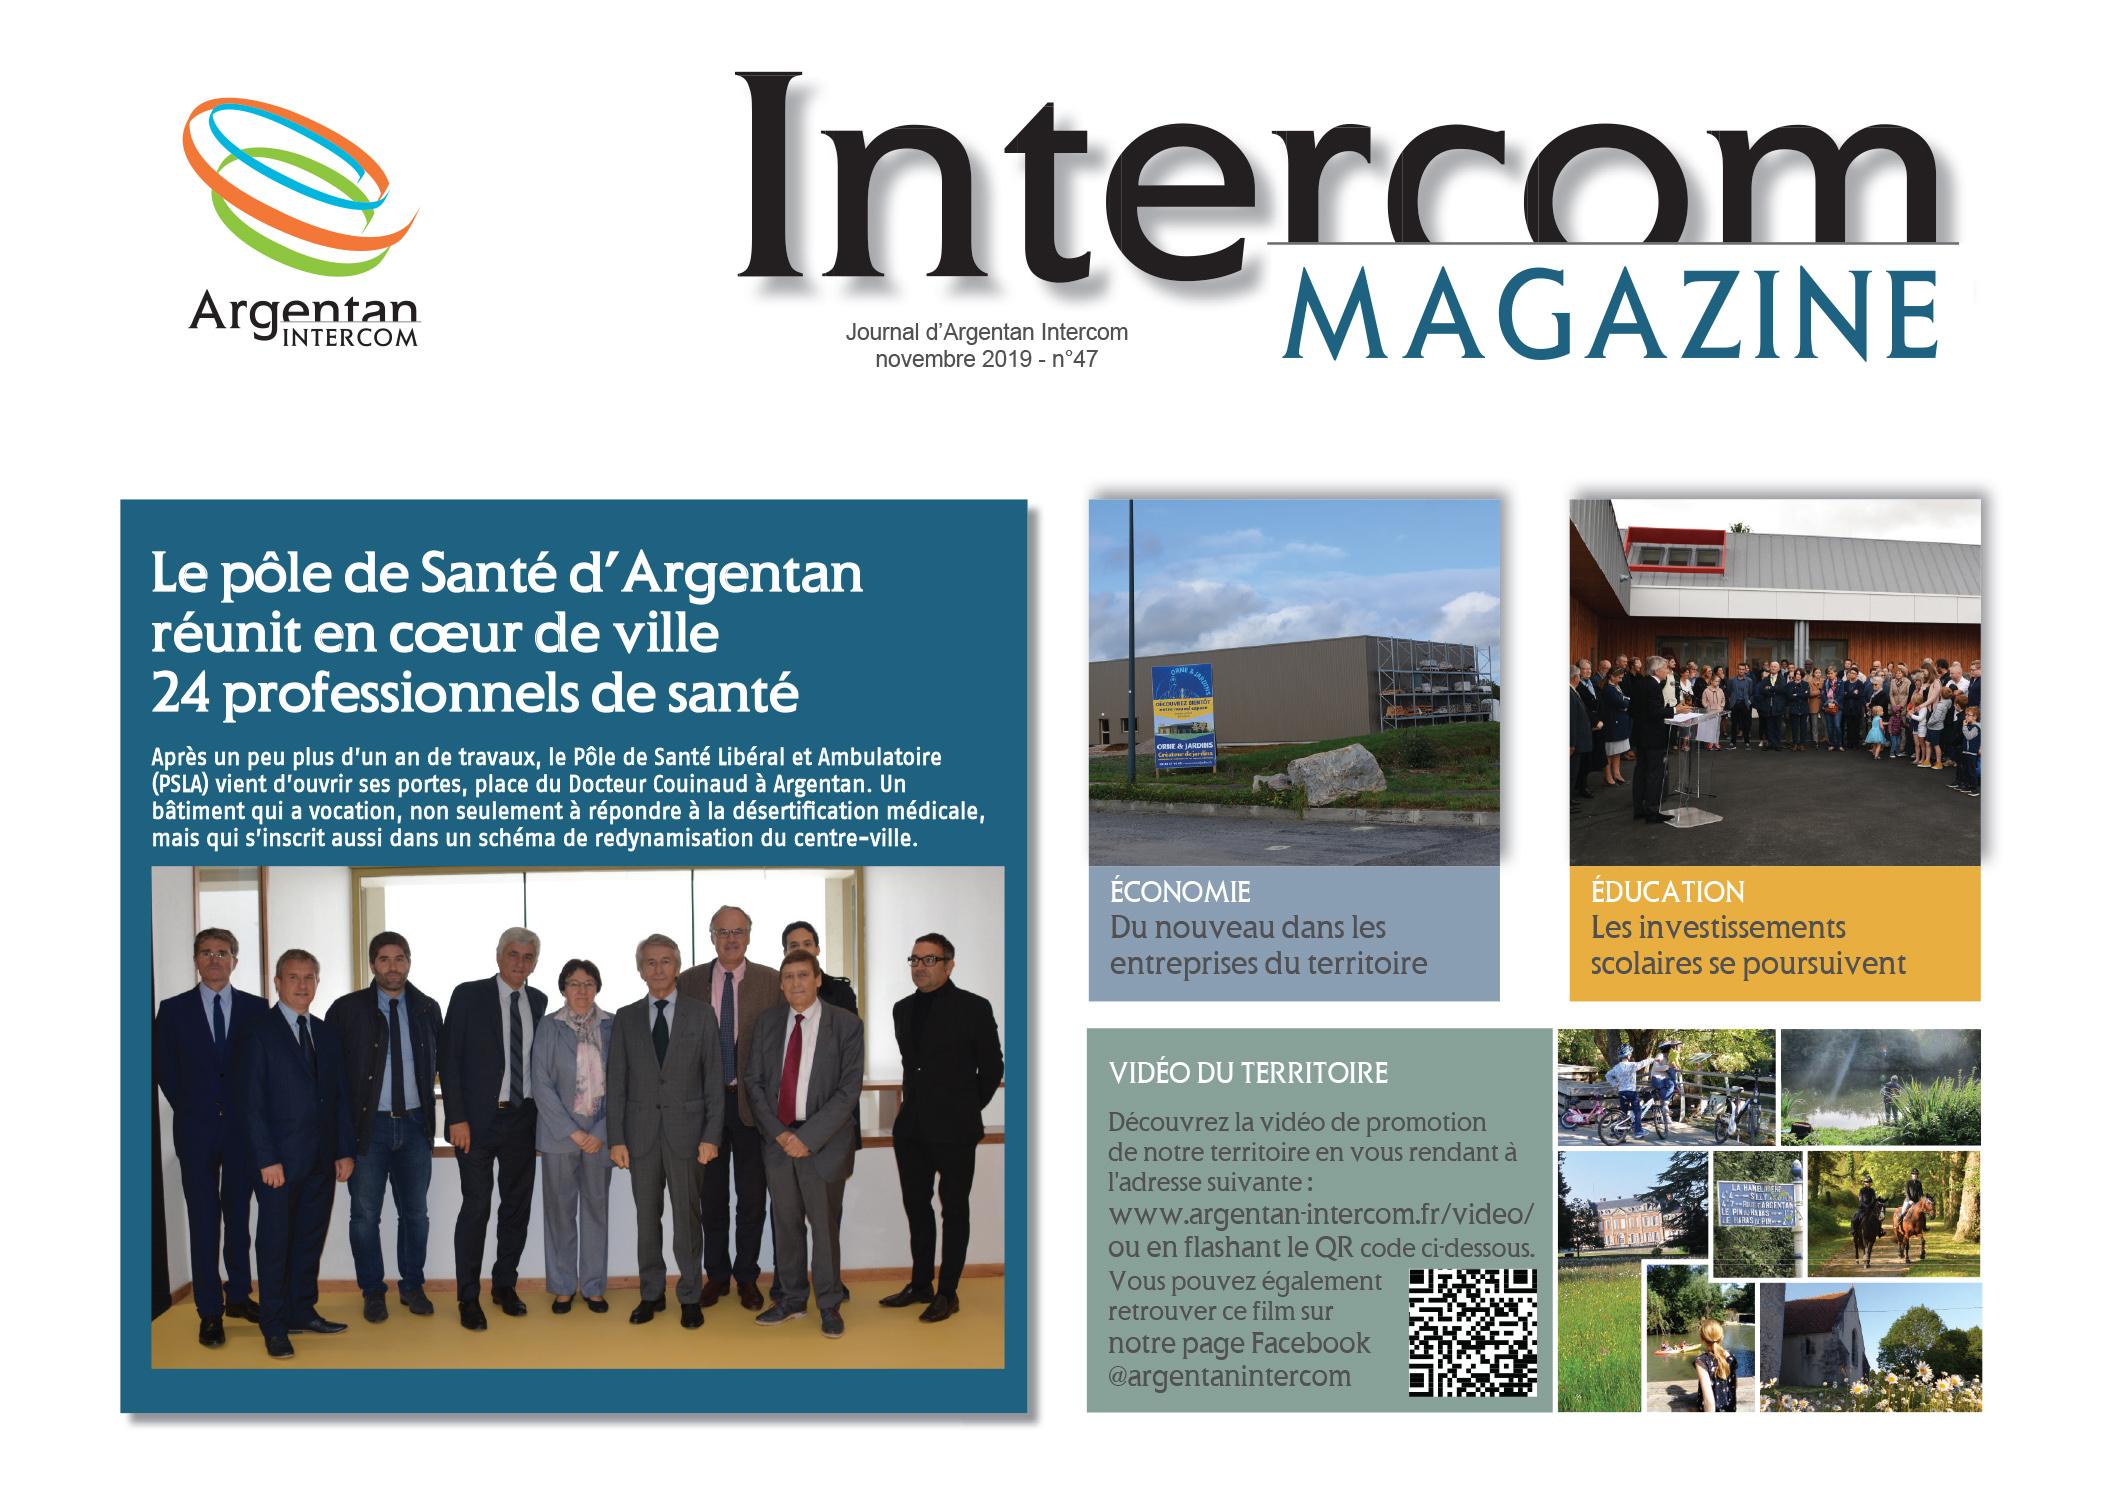 Intercom magazine 47